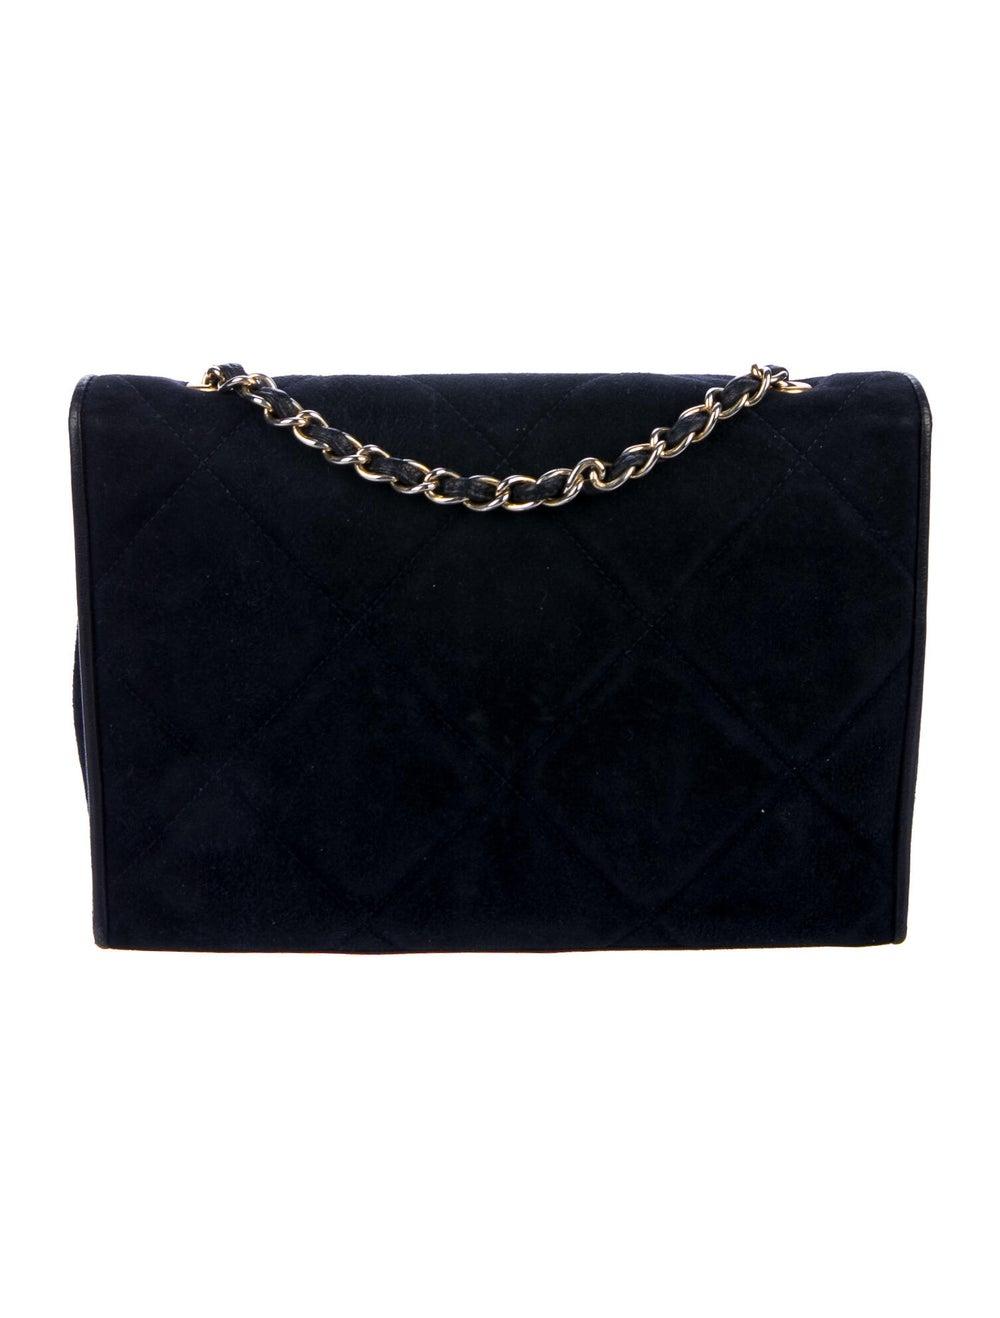 Chanel Vintage Quilted CC Flap Bag Blue - image 4